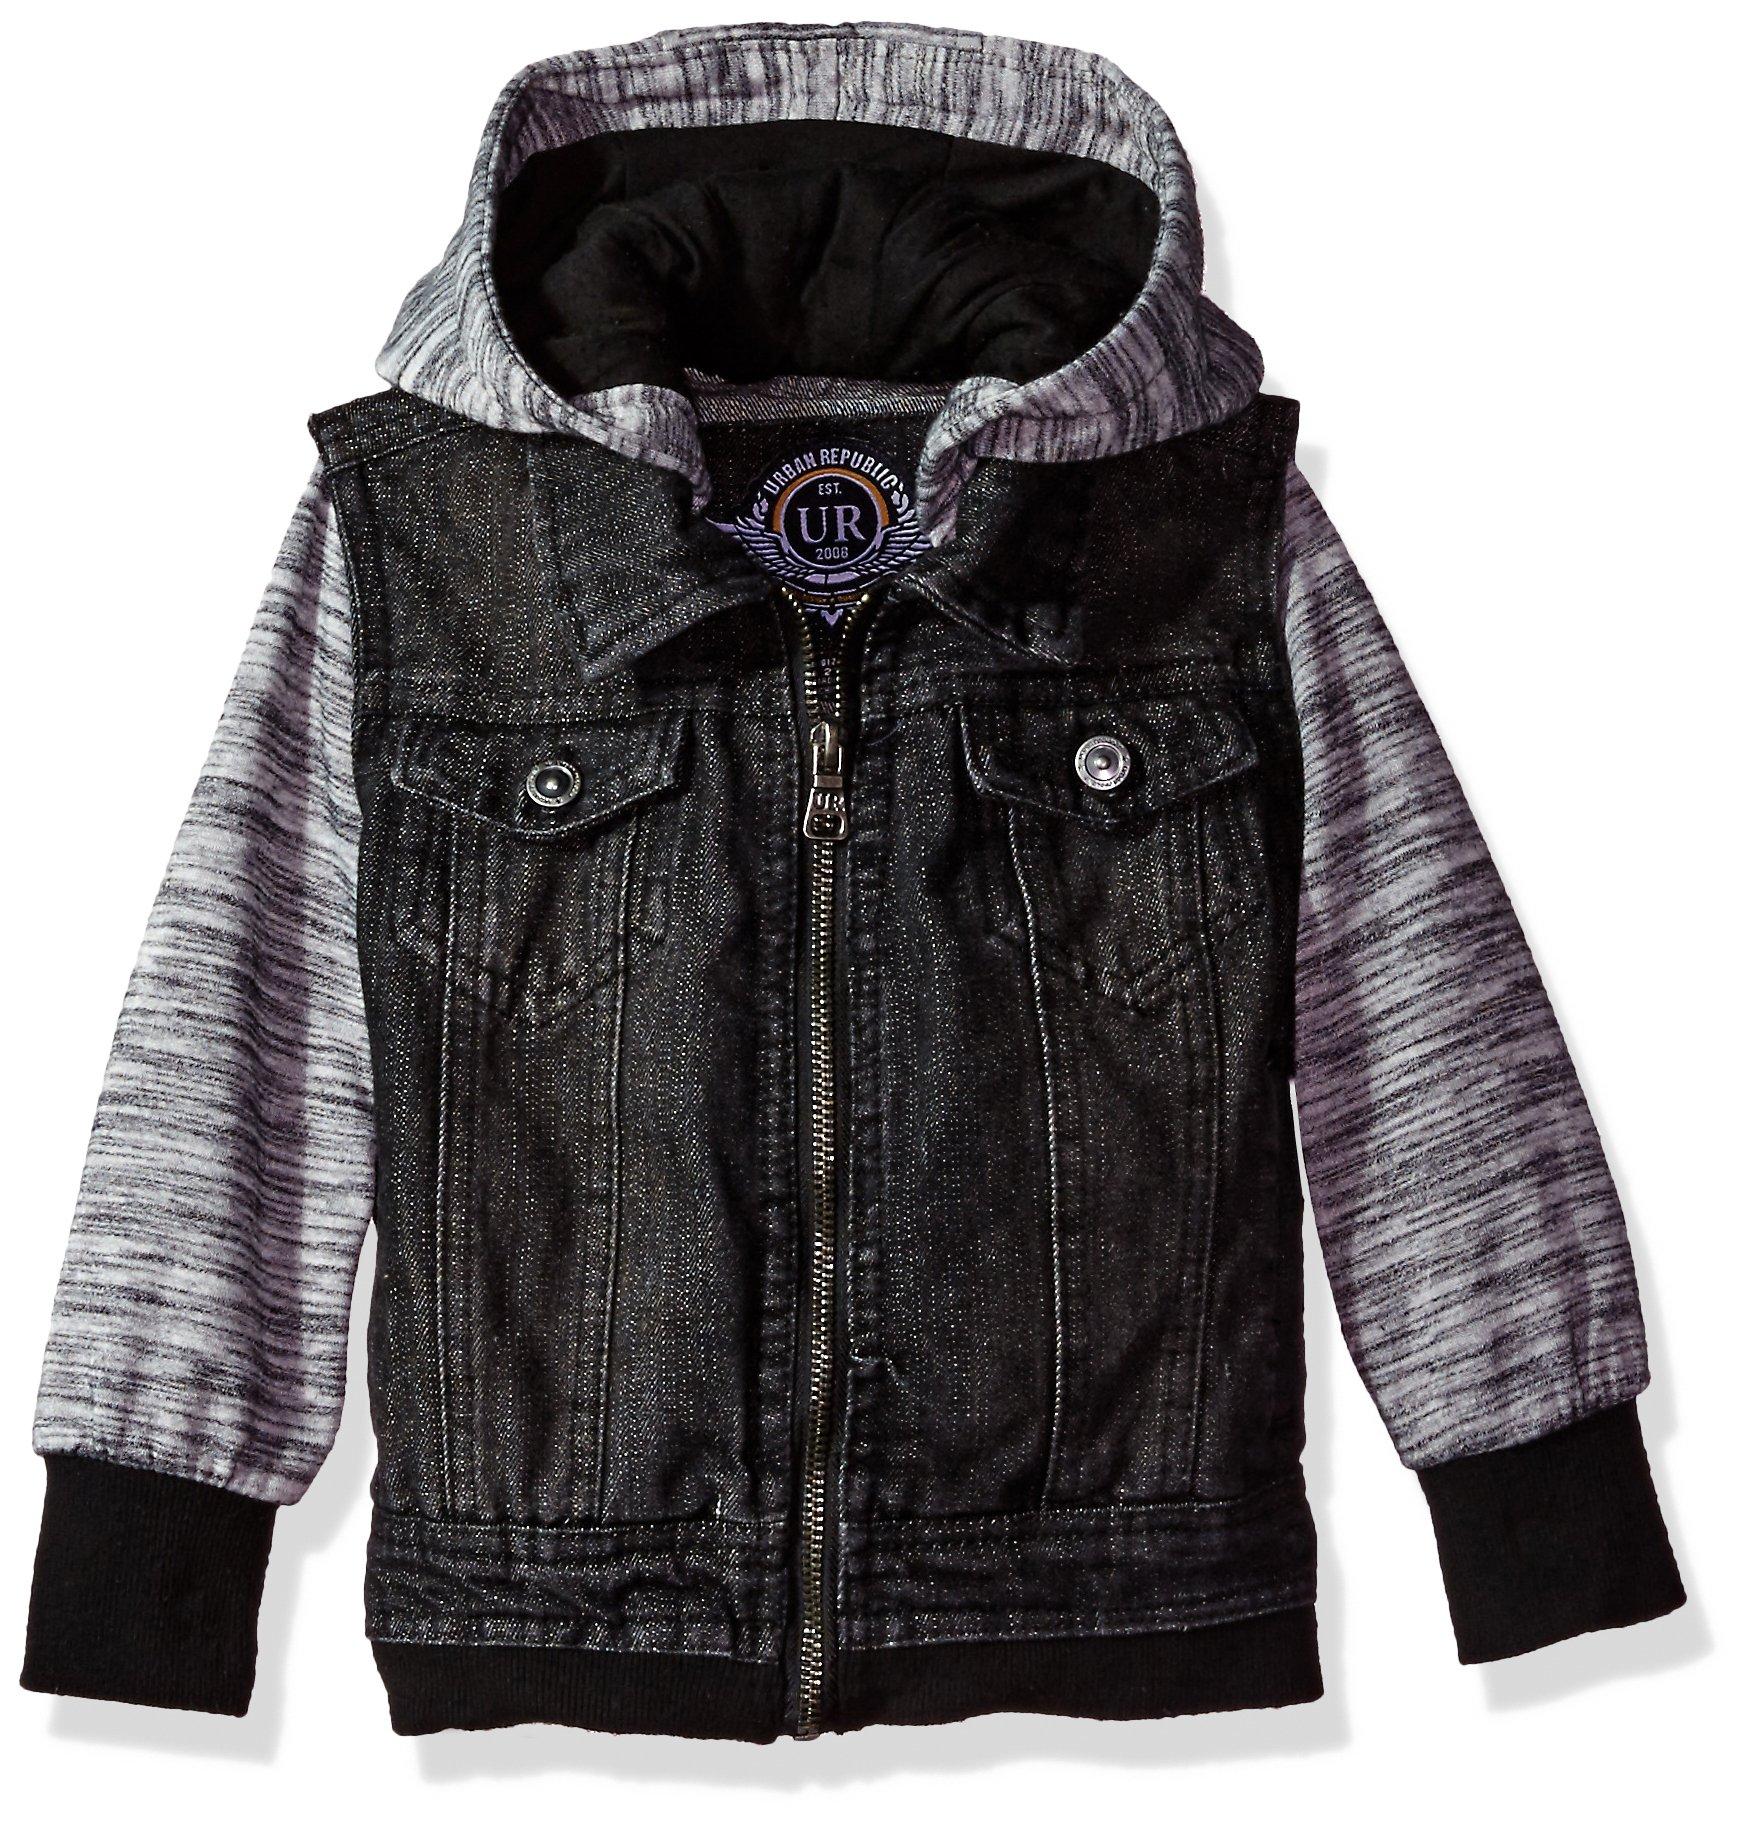 Urban Republic Toddler Ur Boys Cotton Denim Jacket, Black, 3T